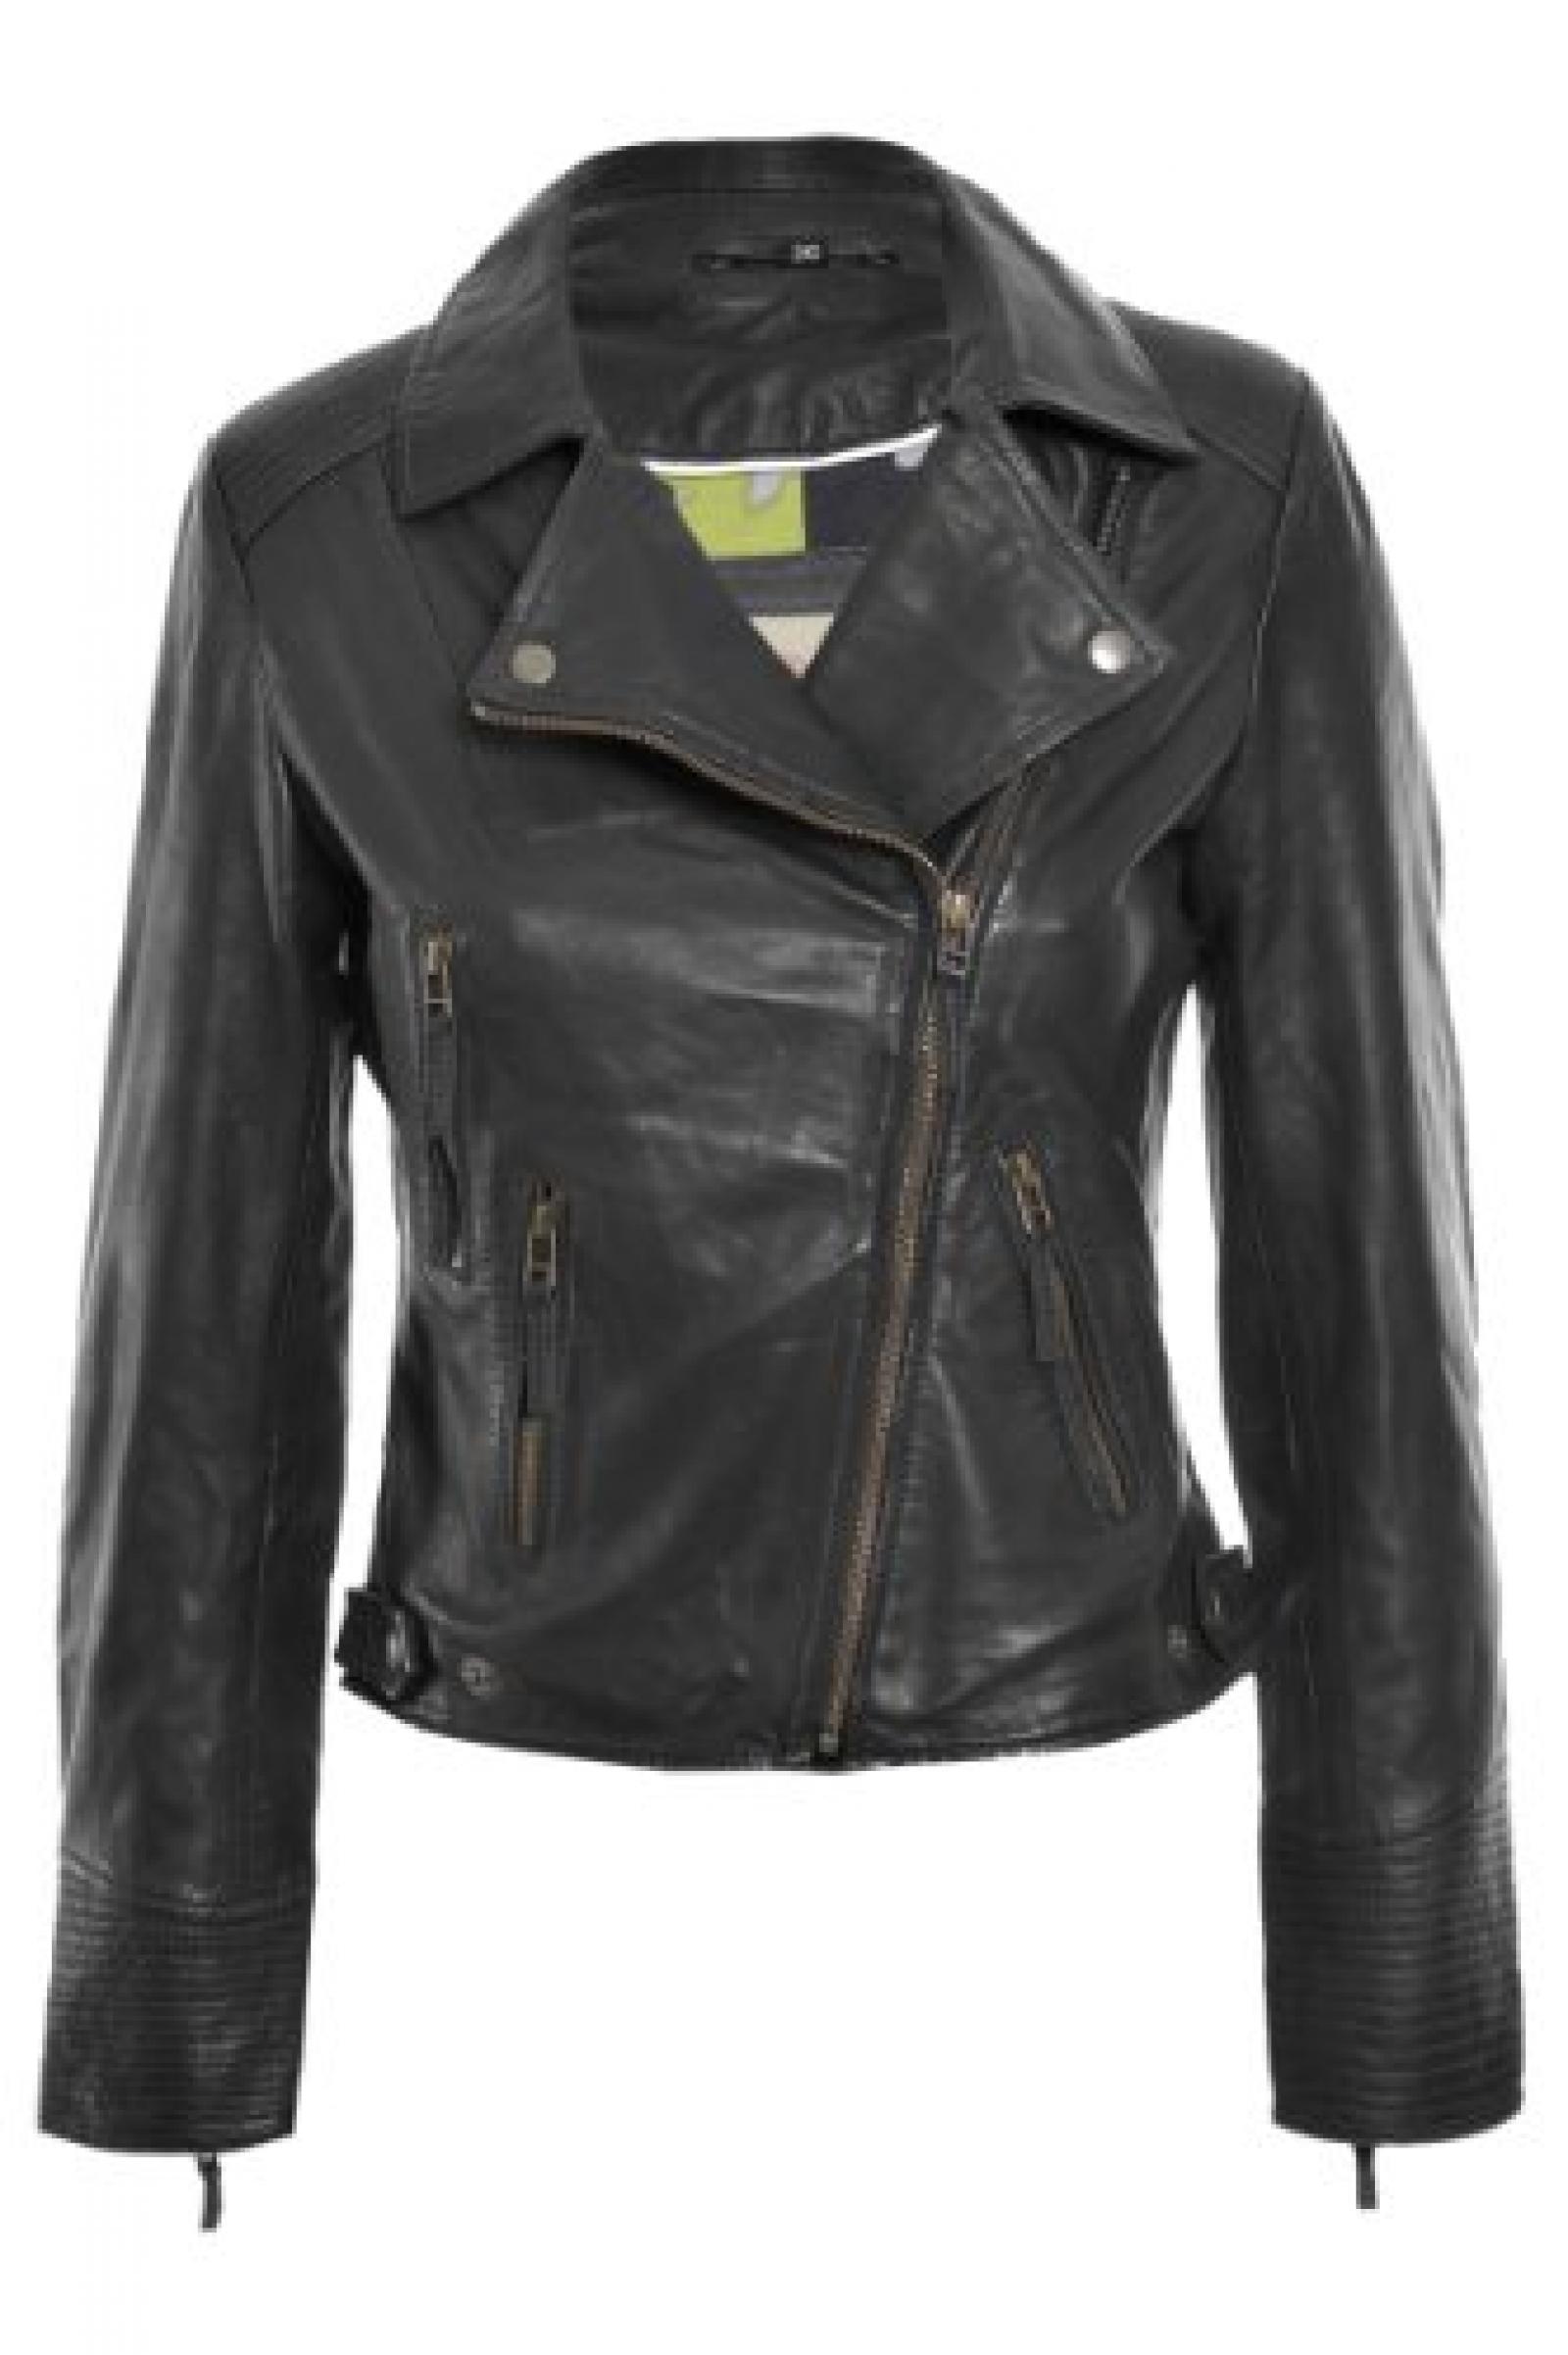 Paisley Park Bikerjacke für Damen 800 8917 aus edlem Lammleder